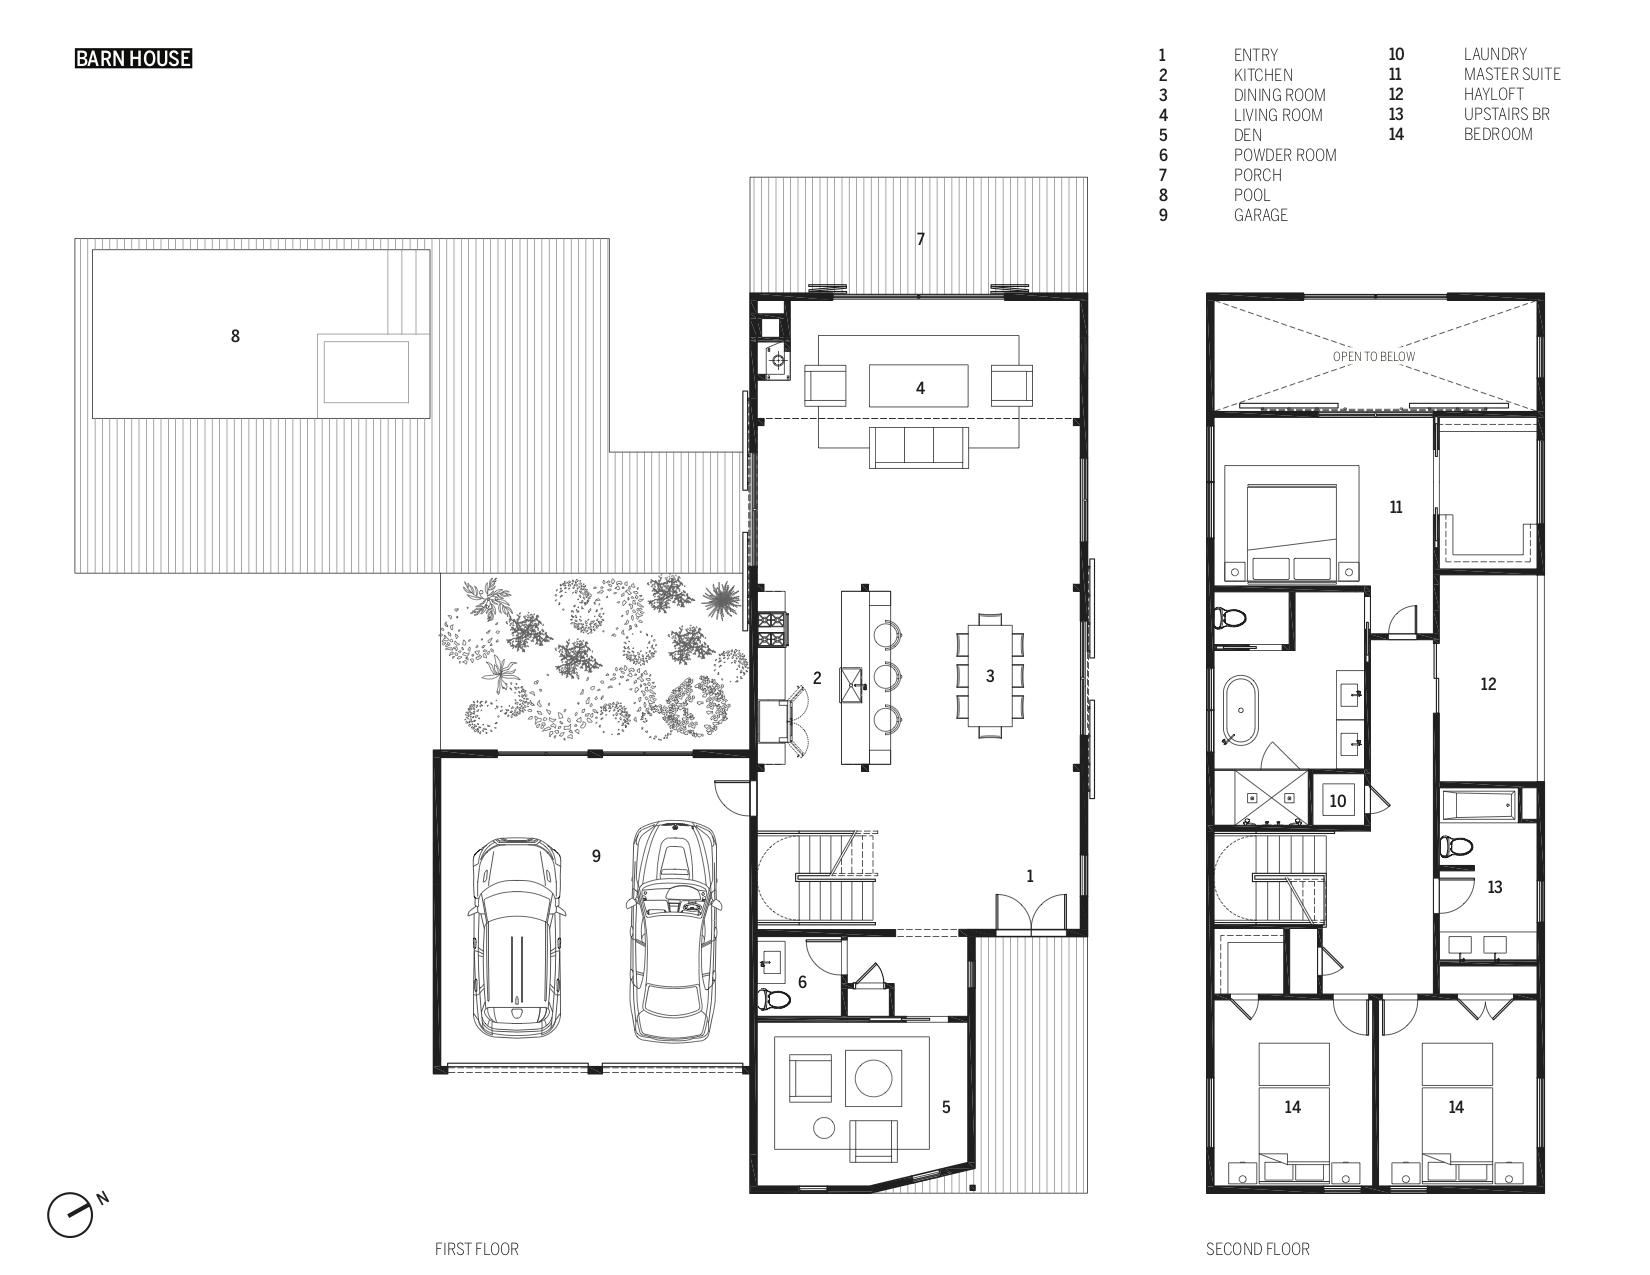 16. barnhouse plan